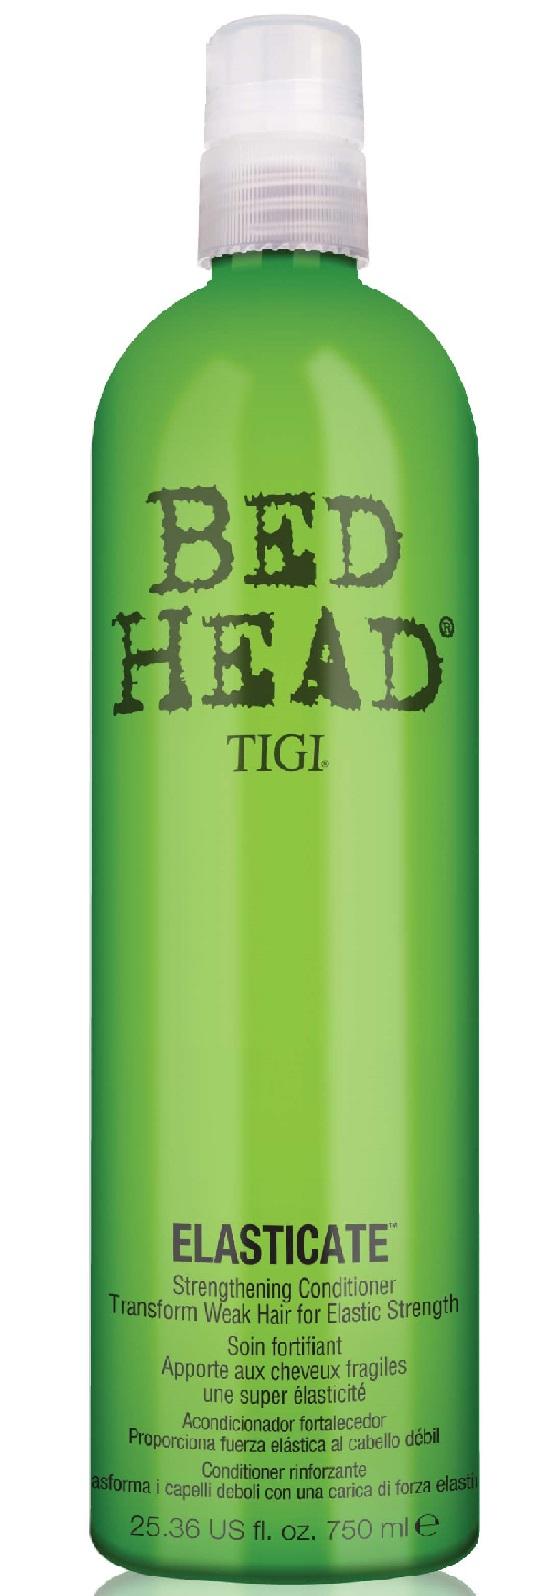 TIGI Bed Head Elasticate Strengthening Conditioner 750ml SALE